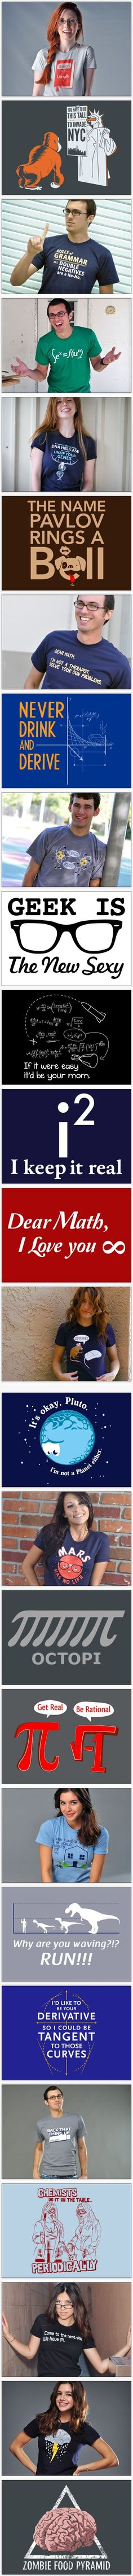 Coolest geek t-shirt designs by SnorgTees | Things for Geeks